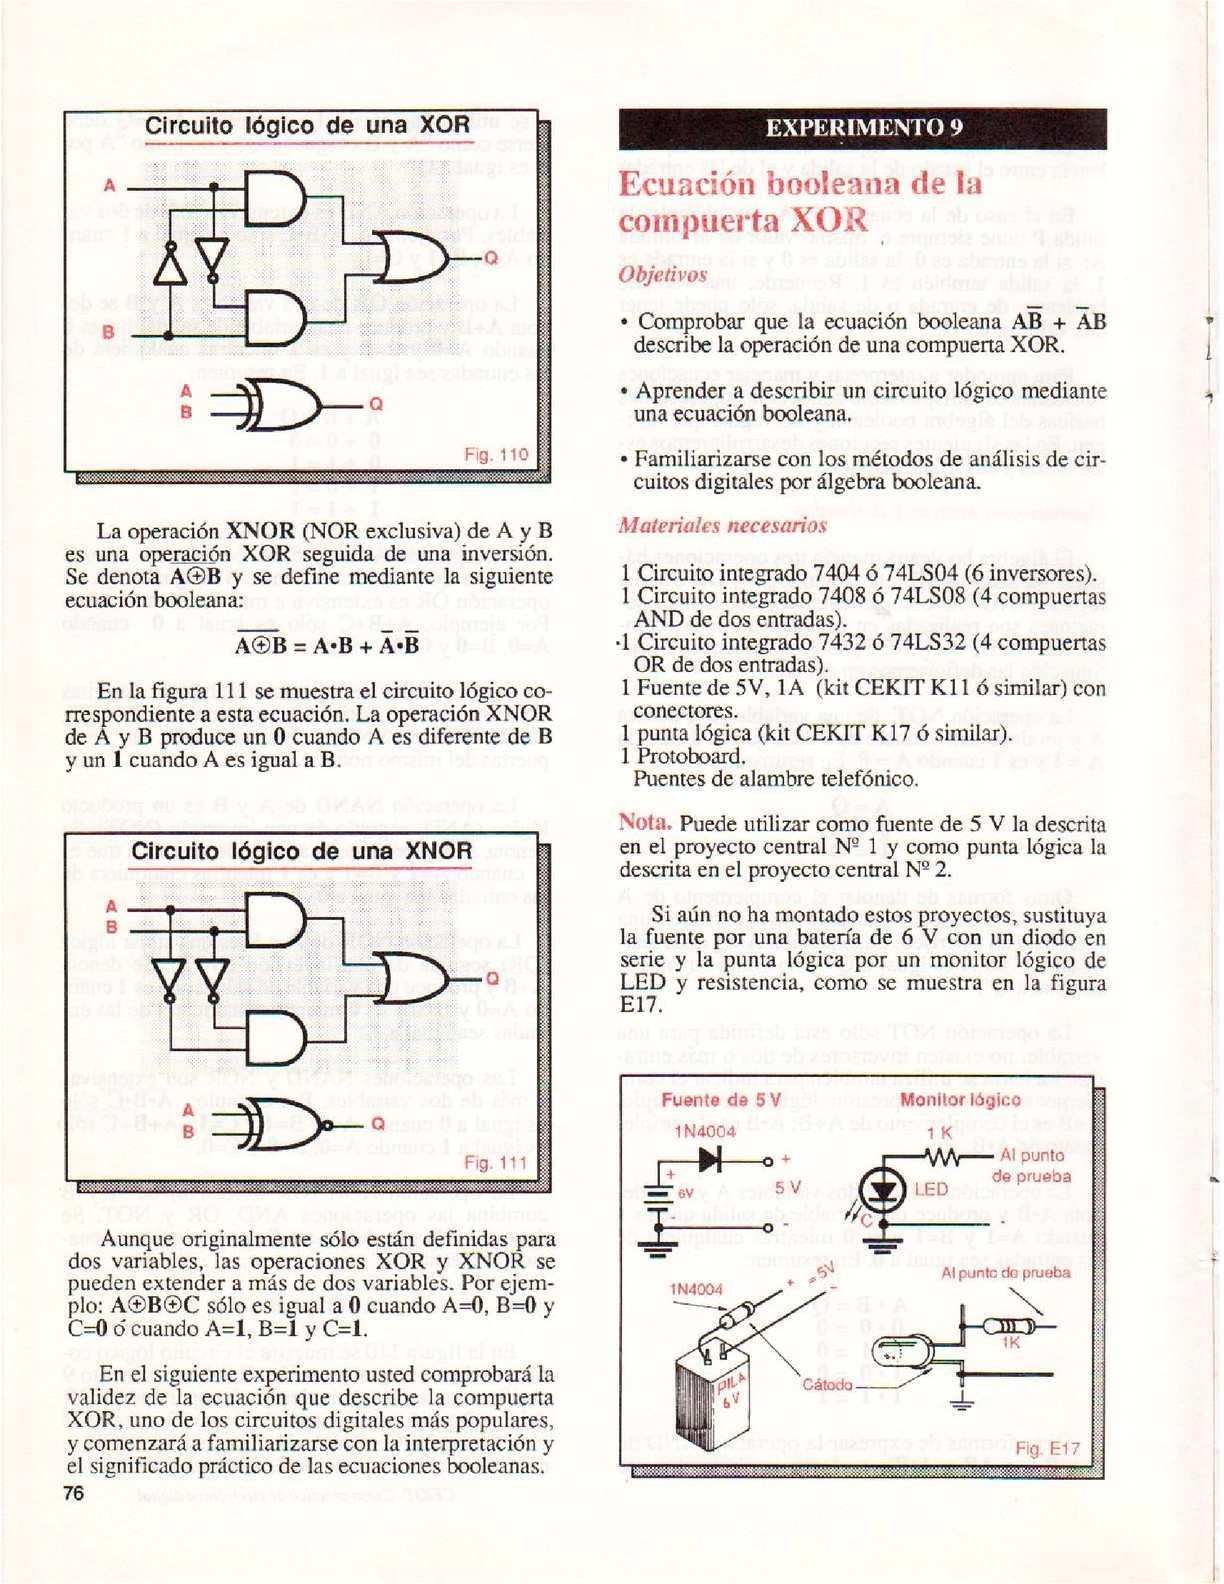 Circuito Xnor : Electronica digital calameo downloader